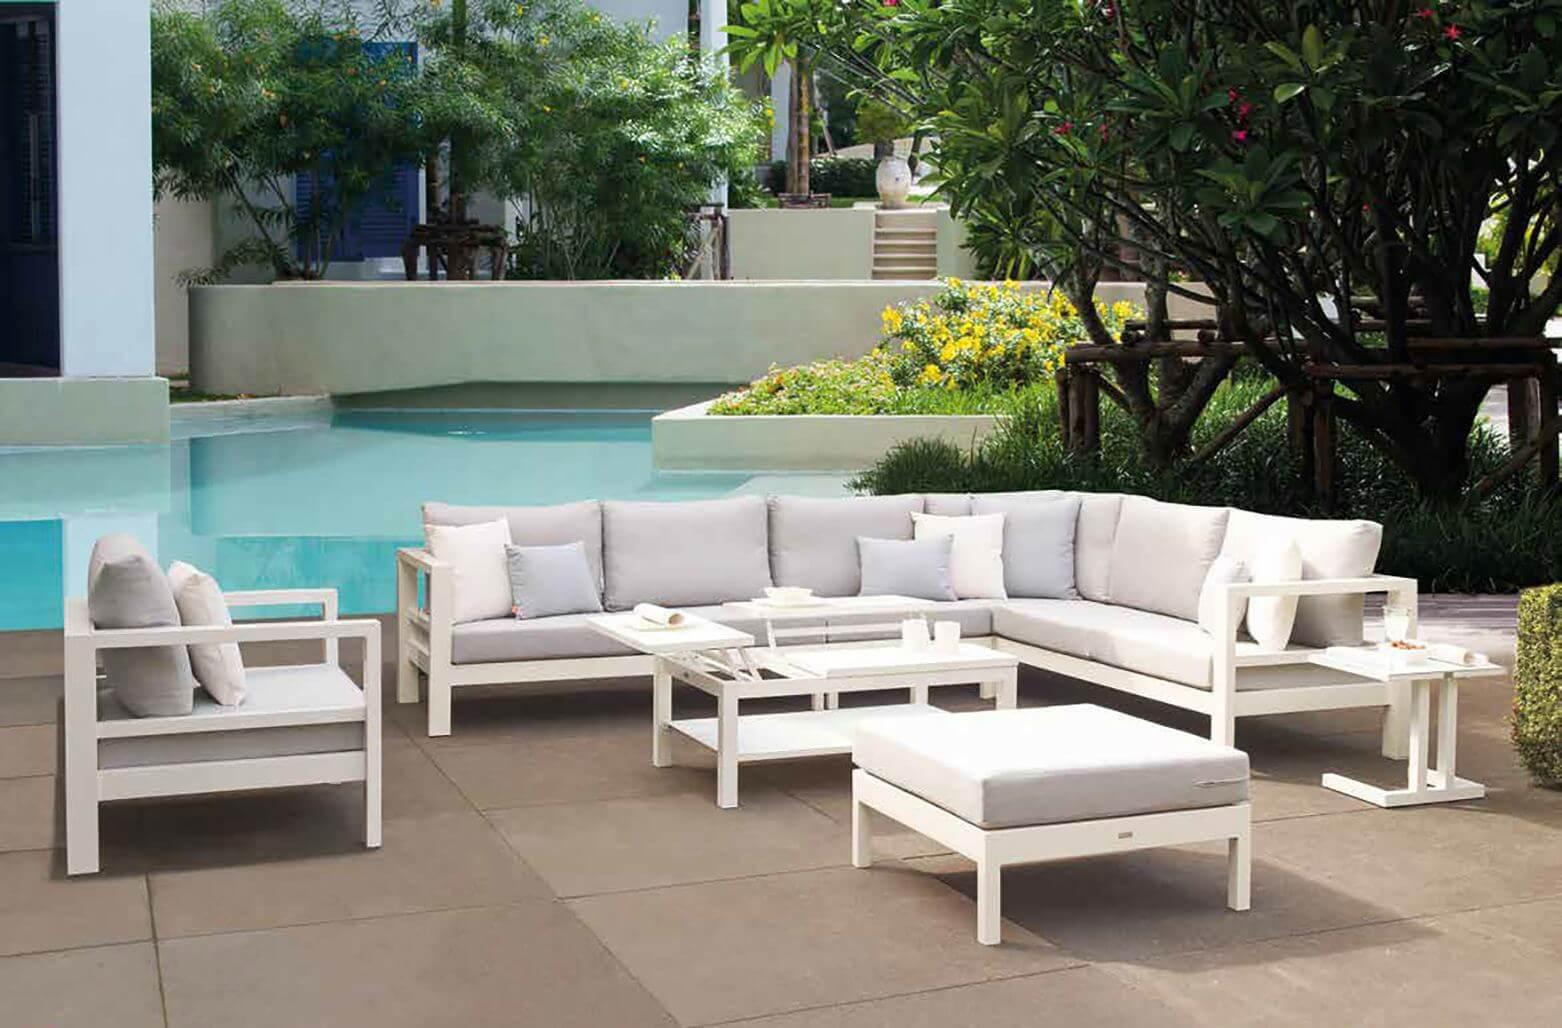 life aluminium loungegruppe delta white 7 personen. Black Bedroom Furniture Sets. Home Design Ideas